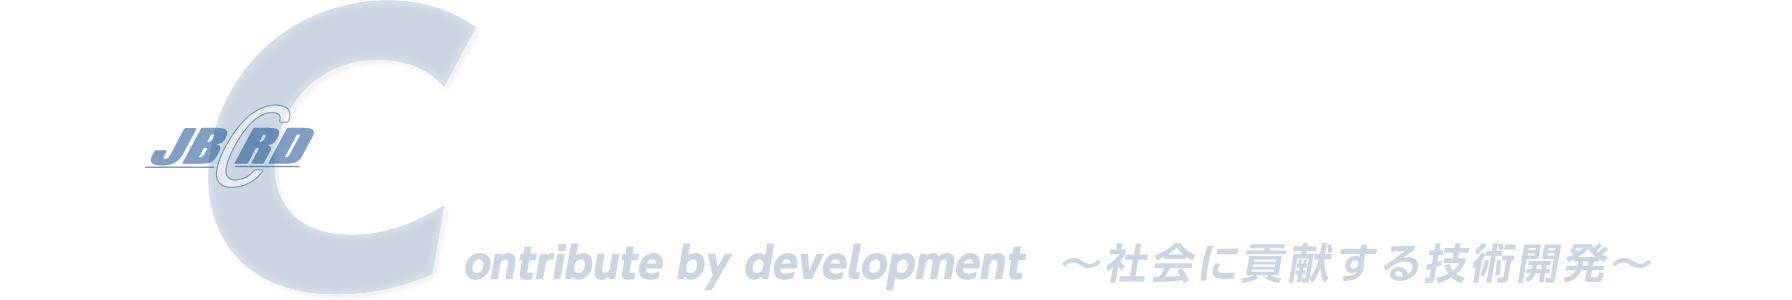 Contribute by development 〜社会に貢献する技術開発〜